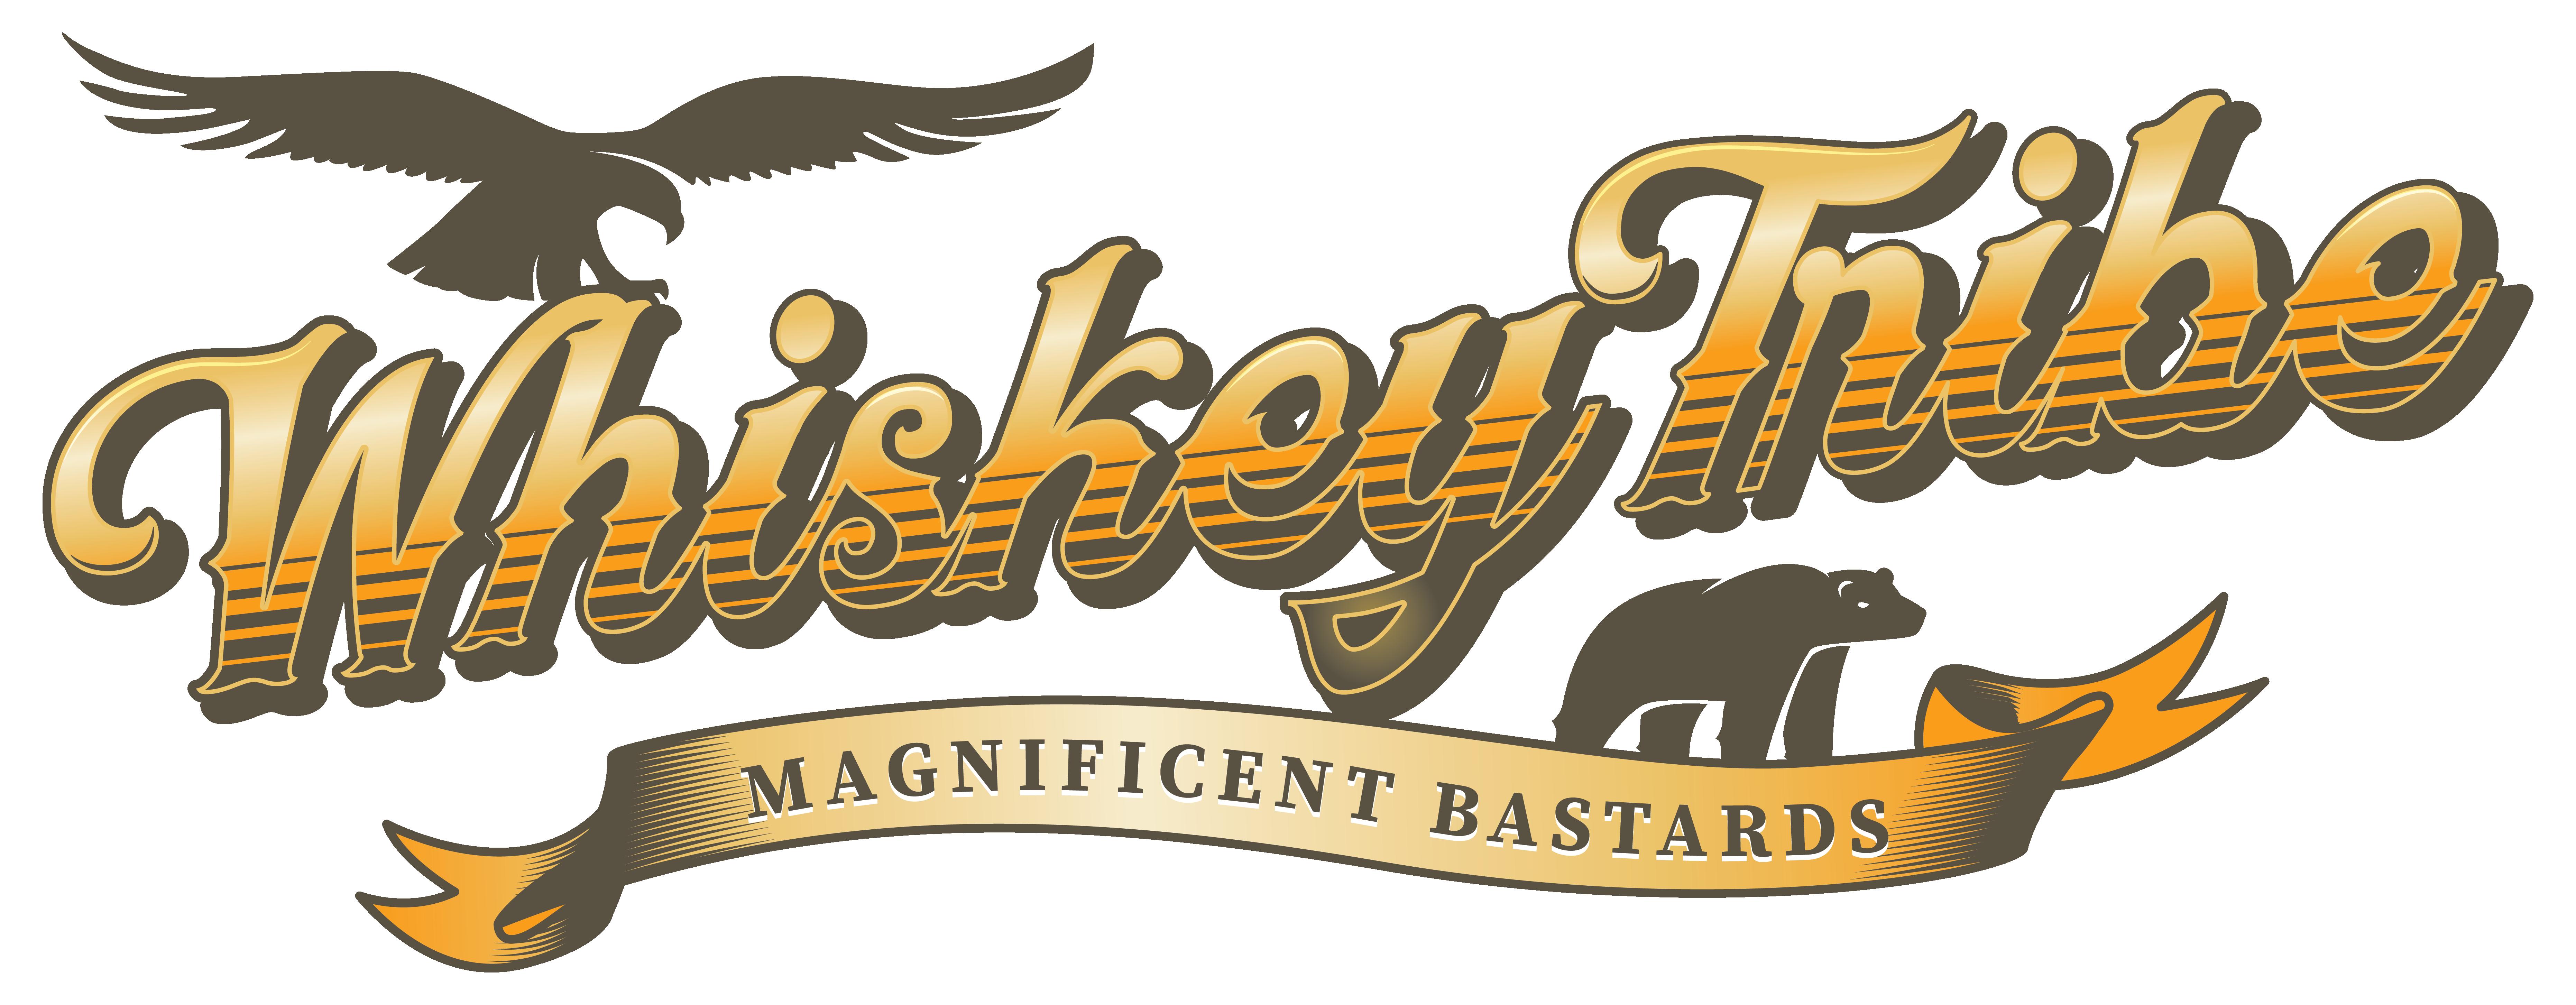 Shenanigan and whiskey loving community needs a logo